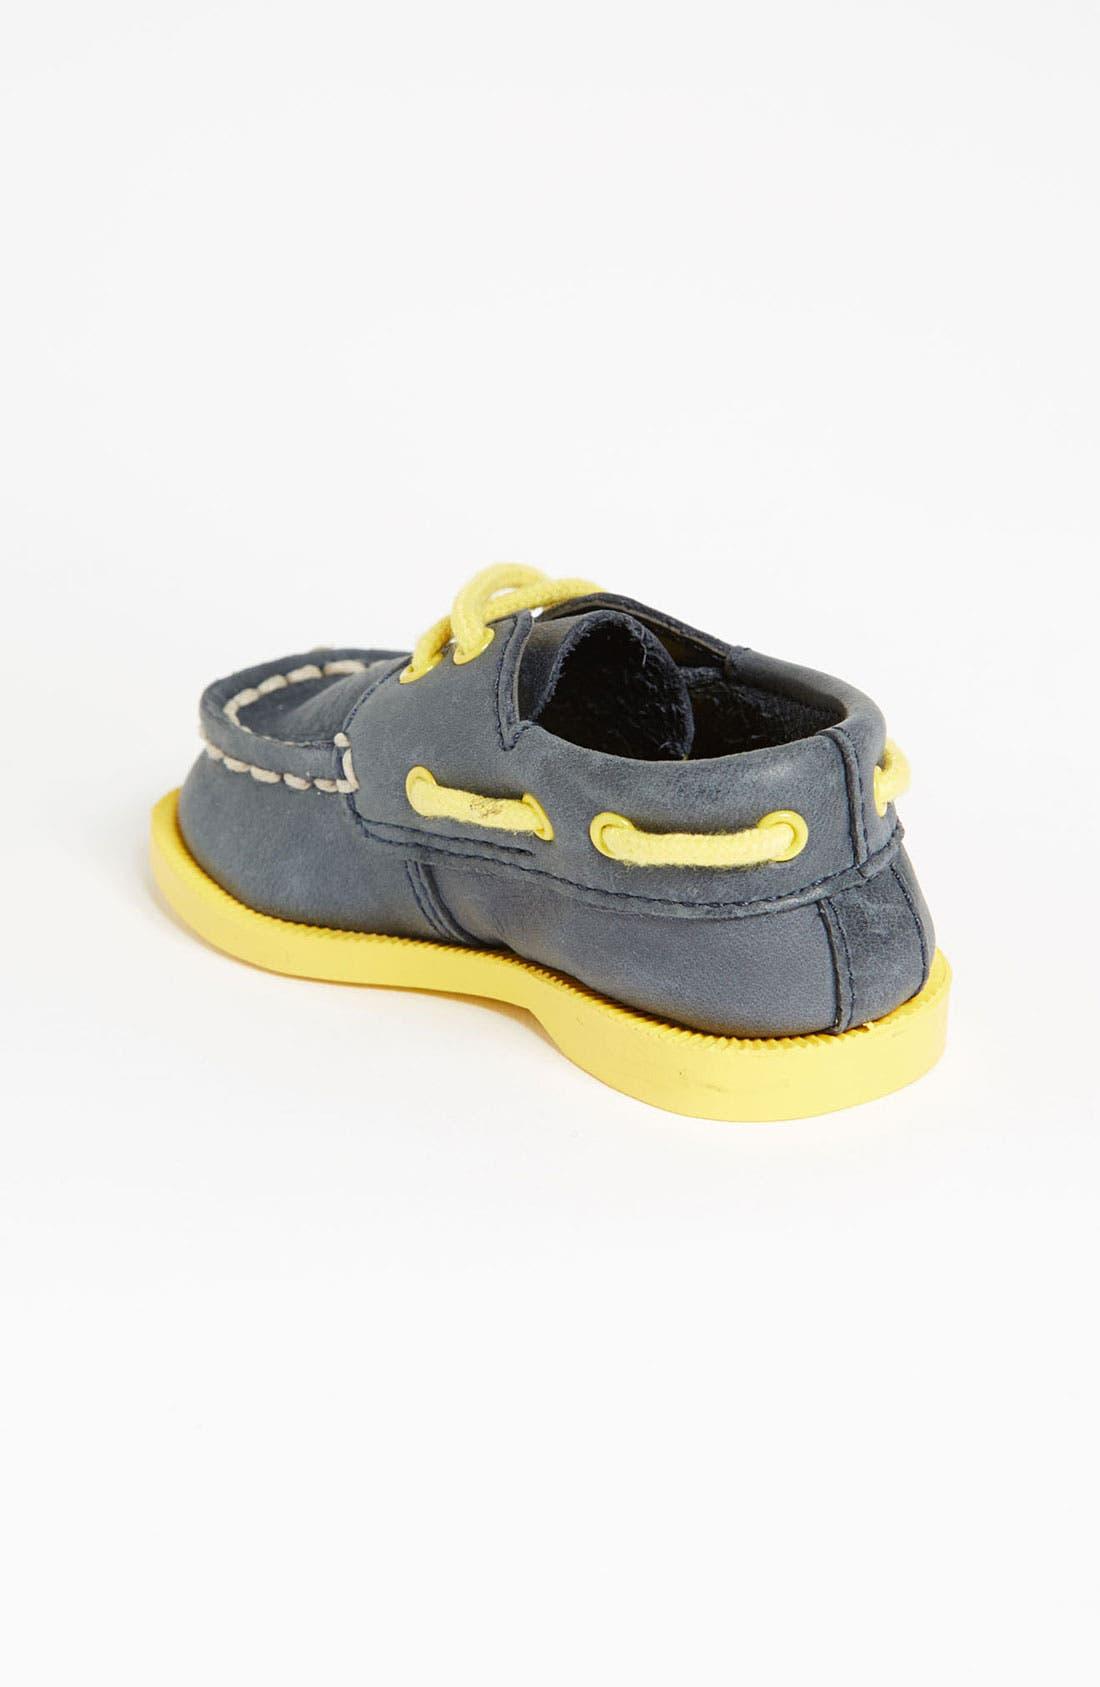 Alternate Image 2  - Sperry Top-Sider® Kids 'Authentic Original' Crib Shoe (Baby)